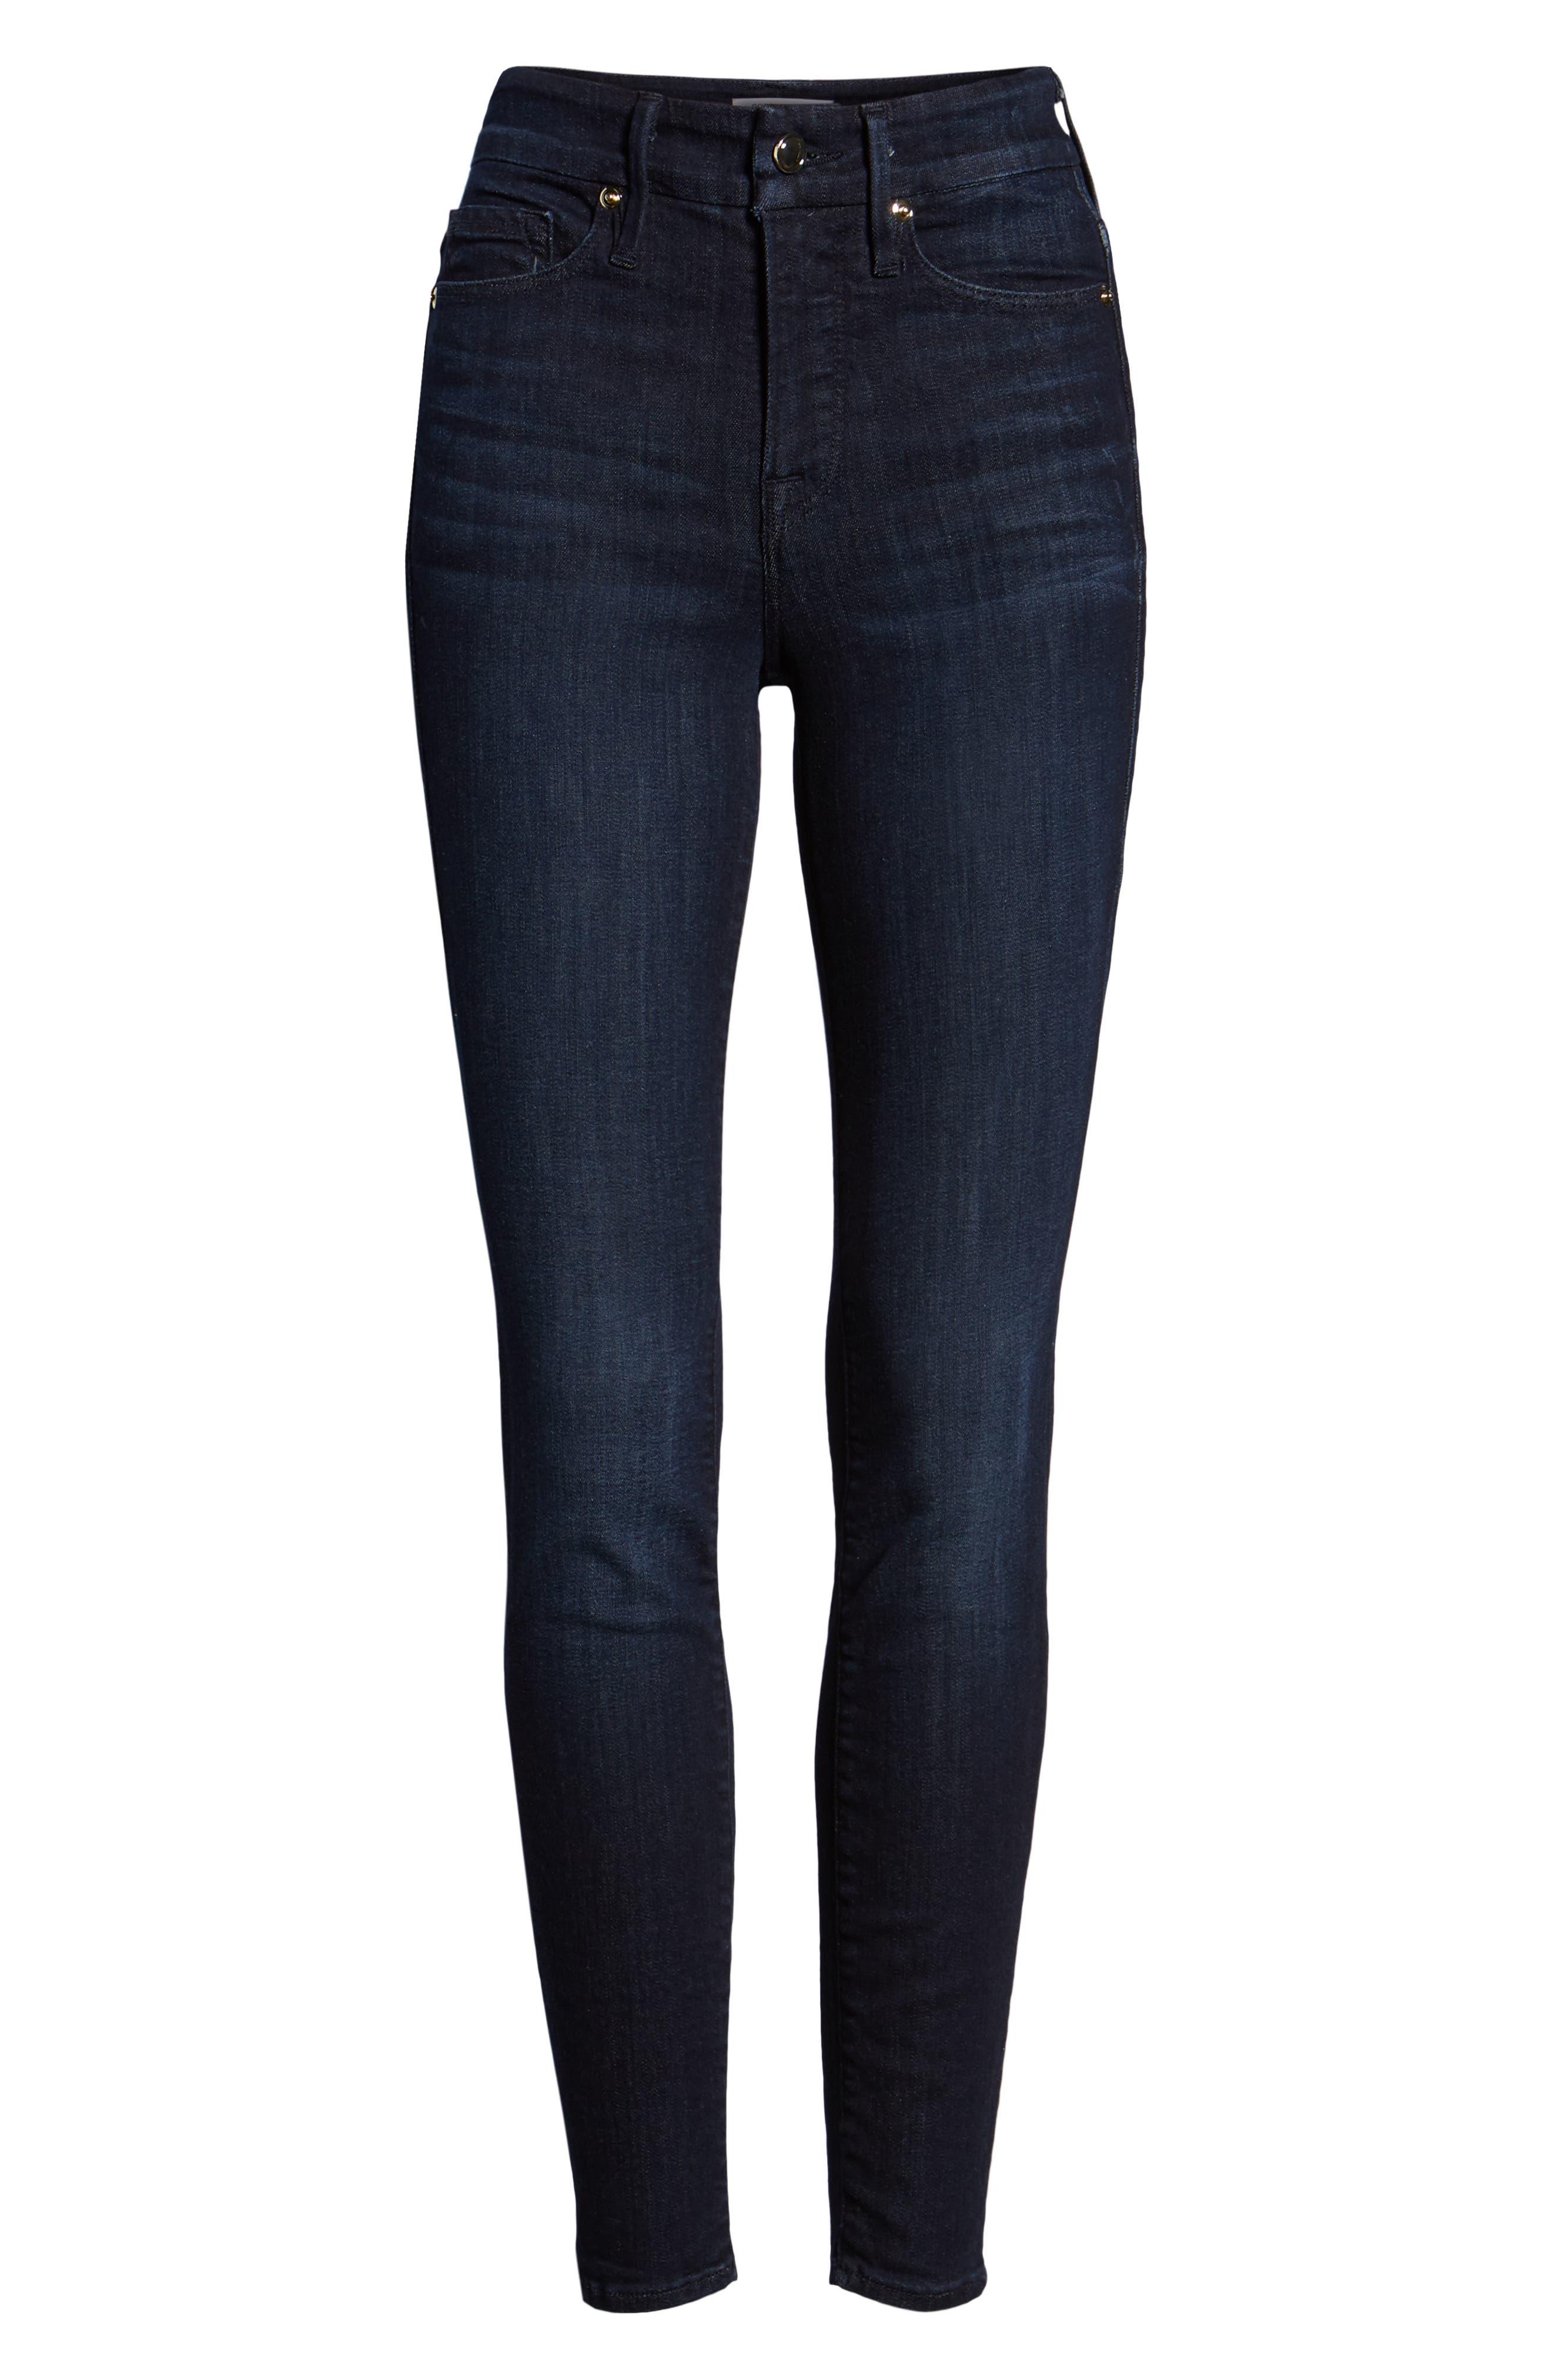 GOOD AMERICAN, Good Legs High Waist Skinny Jeans, Alternate thumbnail 8, color, BLUE224